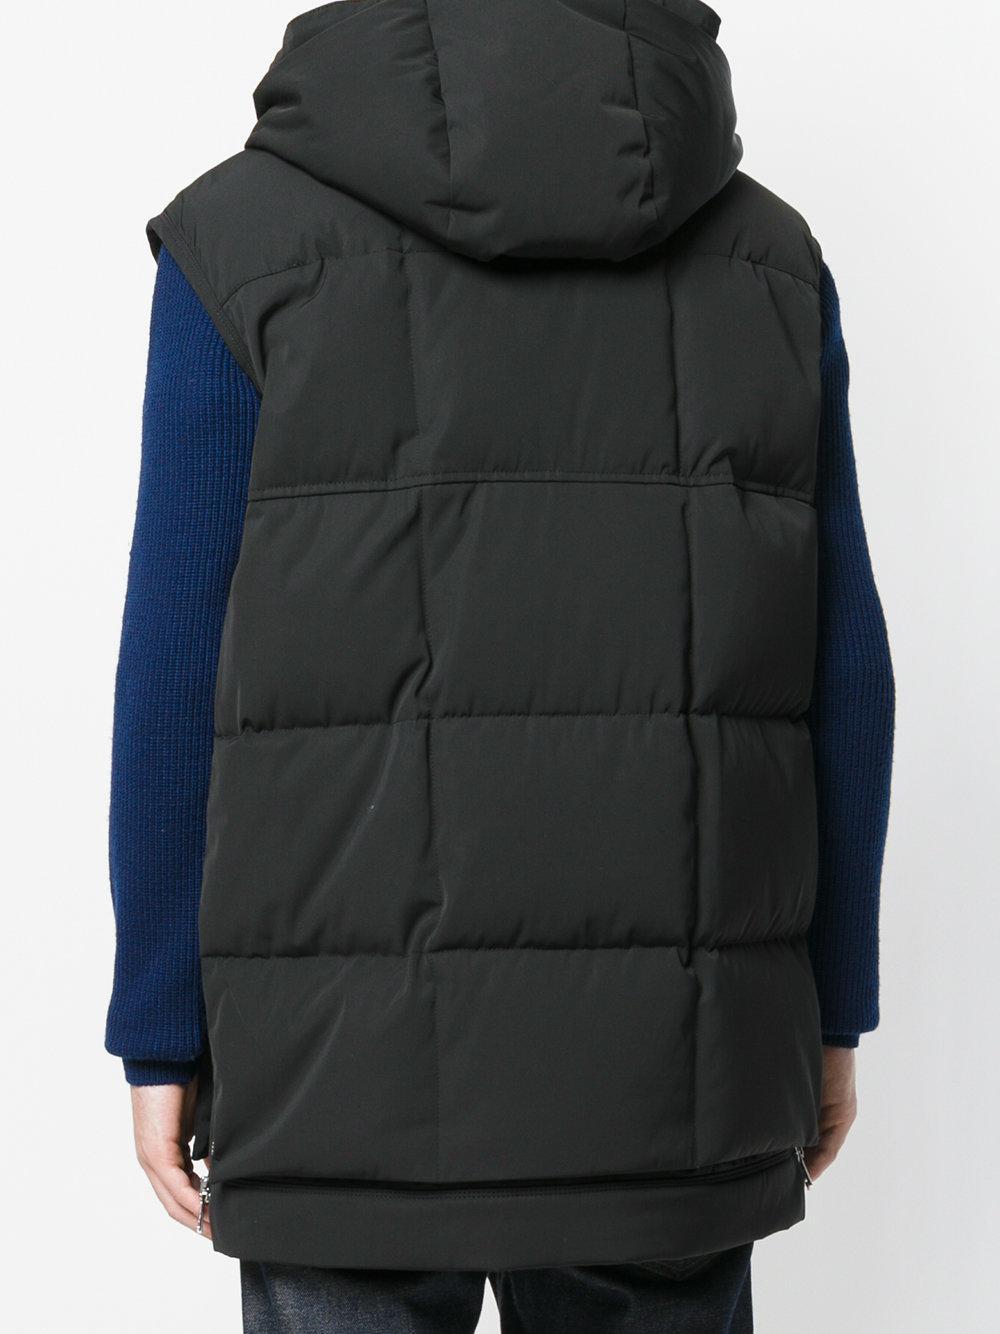 Moncler Cotton Stripe Patch Gilet in Black for Men